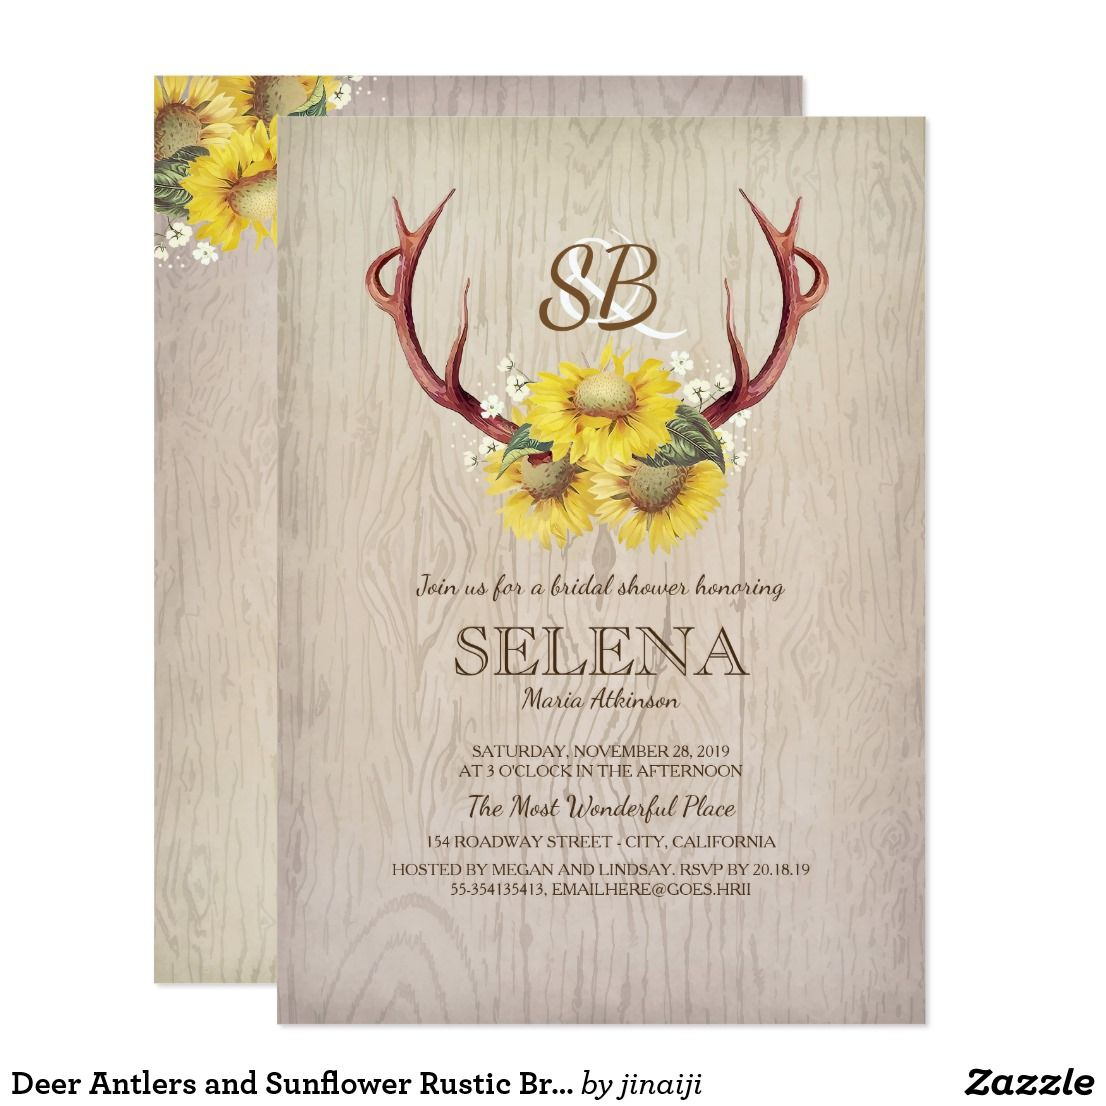 Deer Antlers And Sunflower Rustic Bridal Shower Card Rustic Bridal